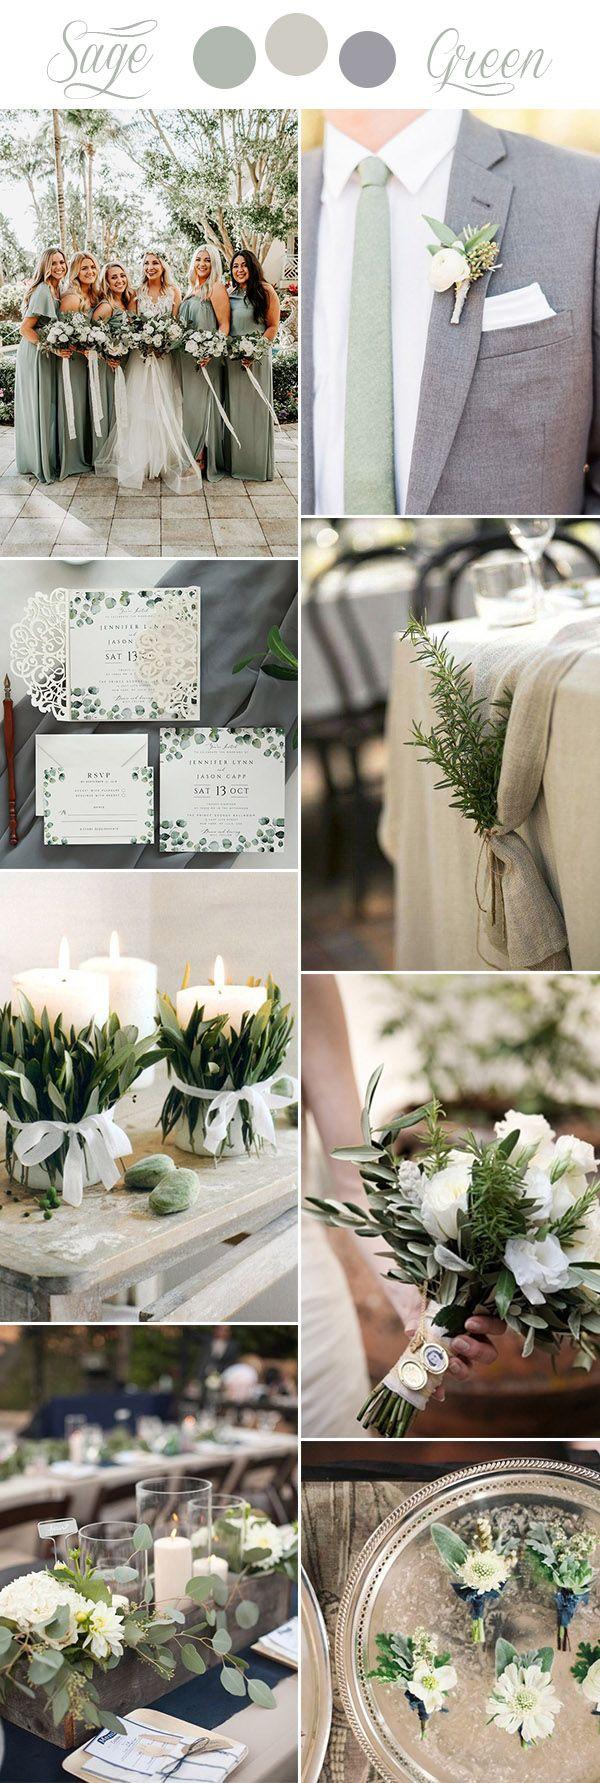 7 Gorgeous Rustic Romantic and Elegant Wedding Ideas & Color Palettes